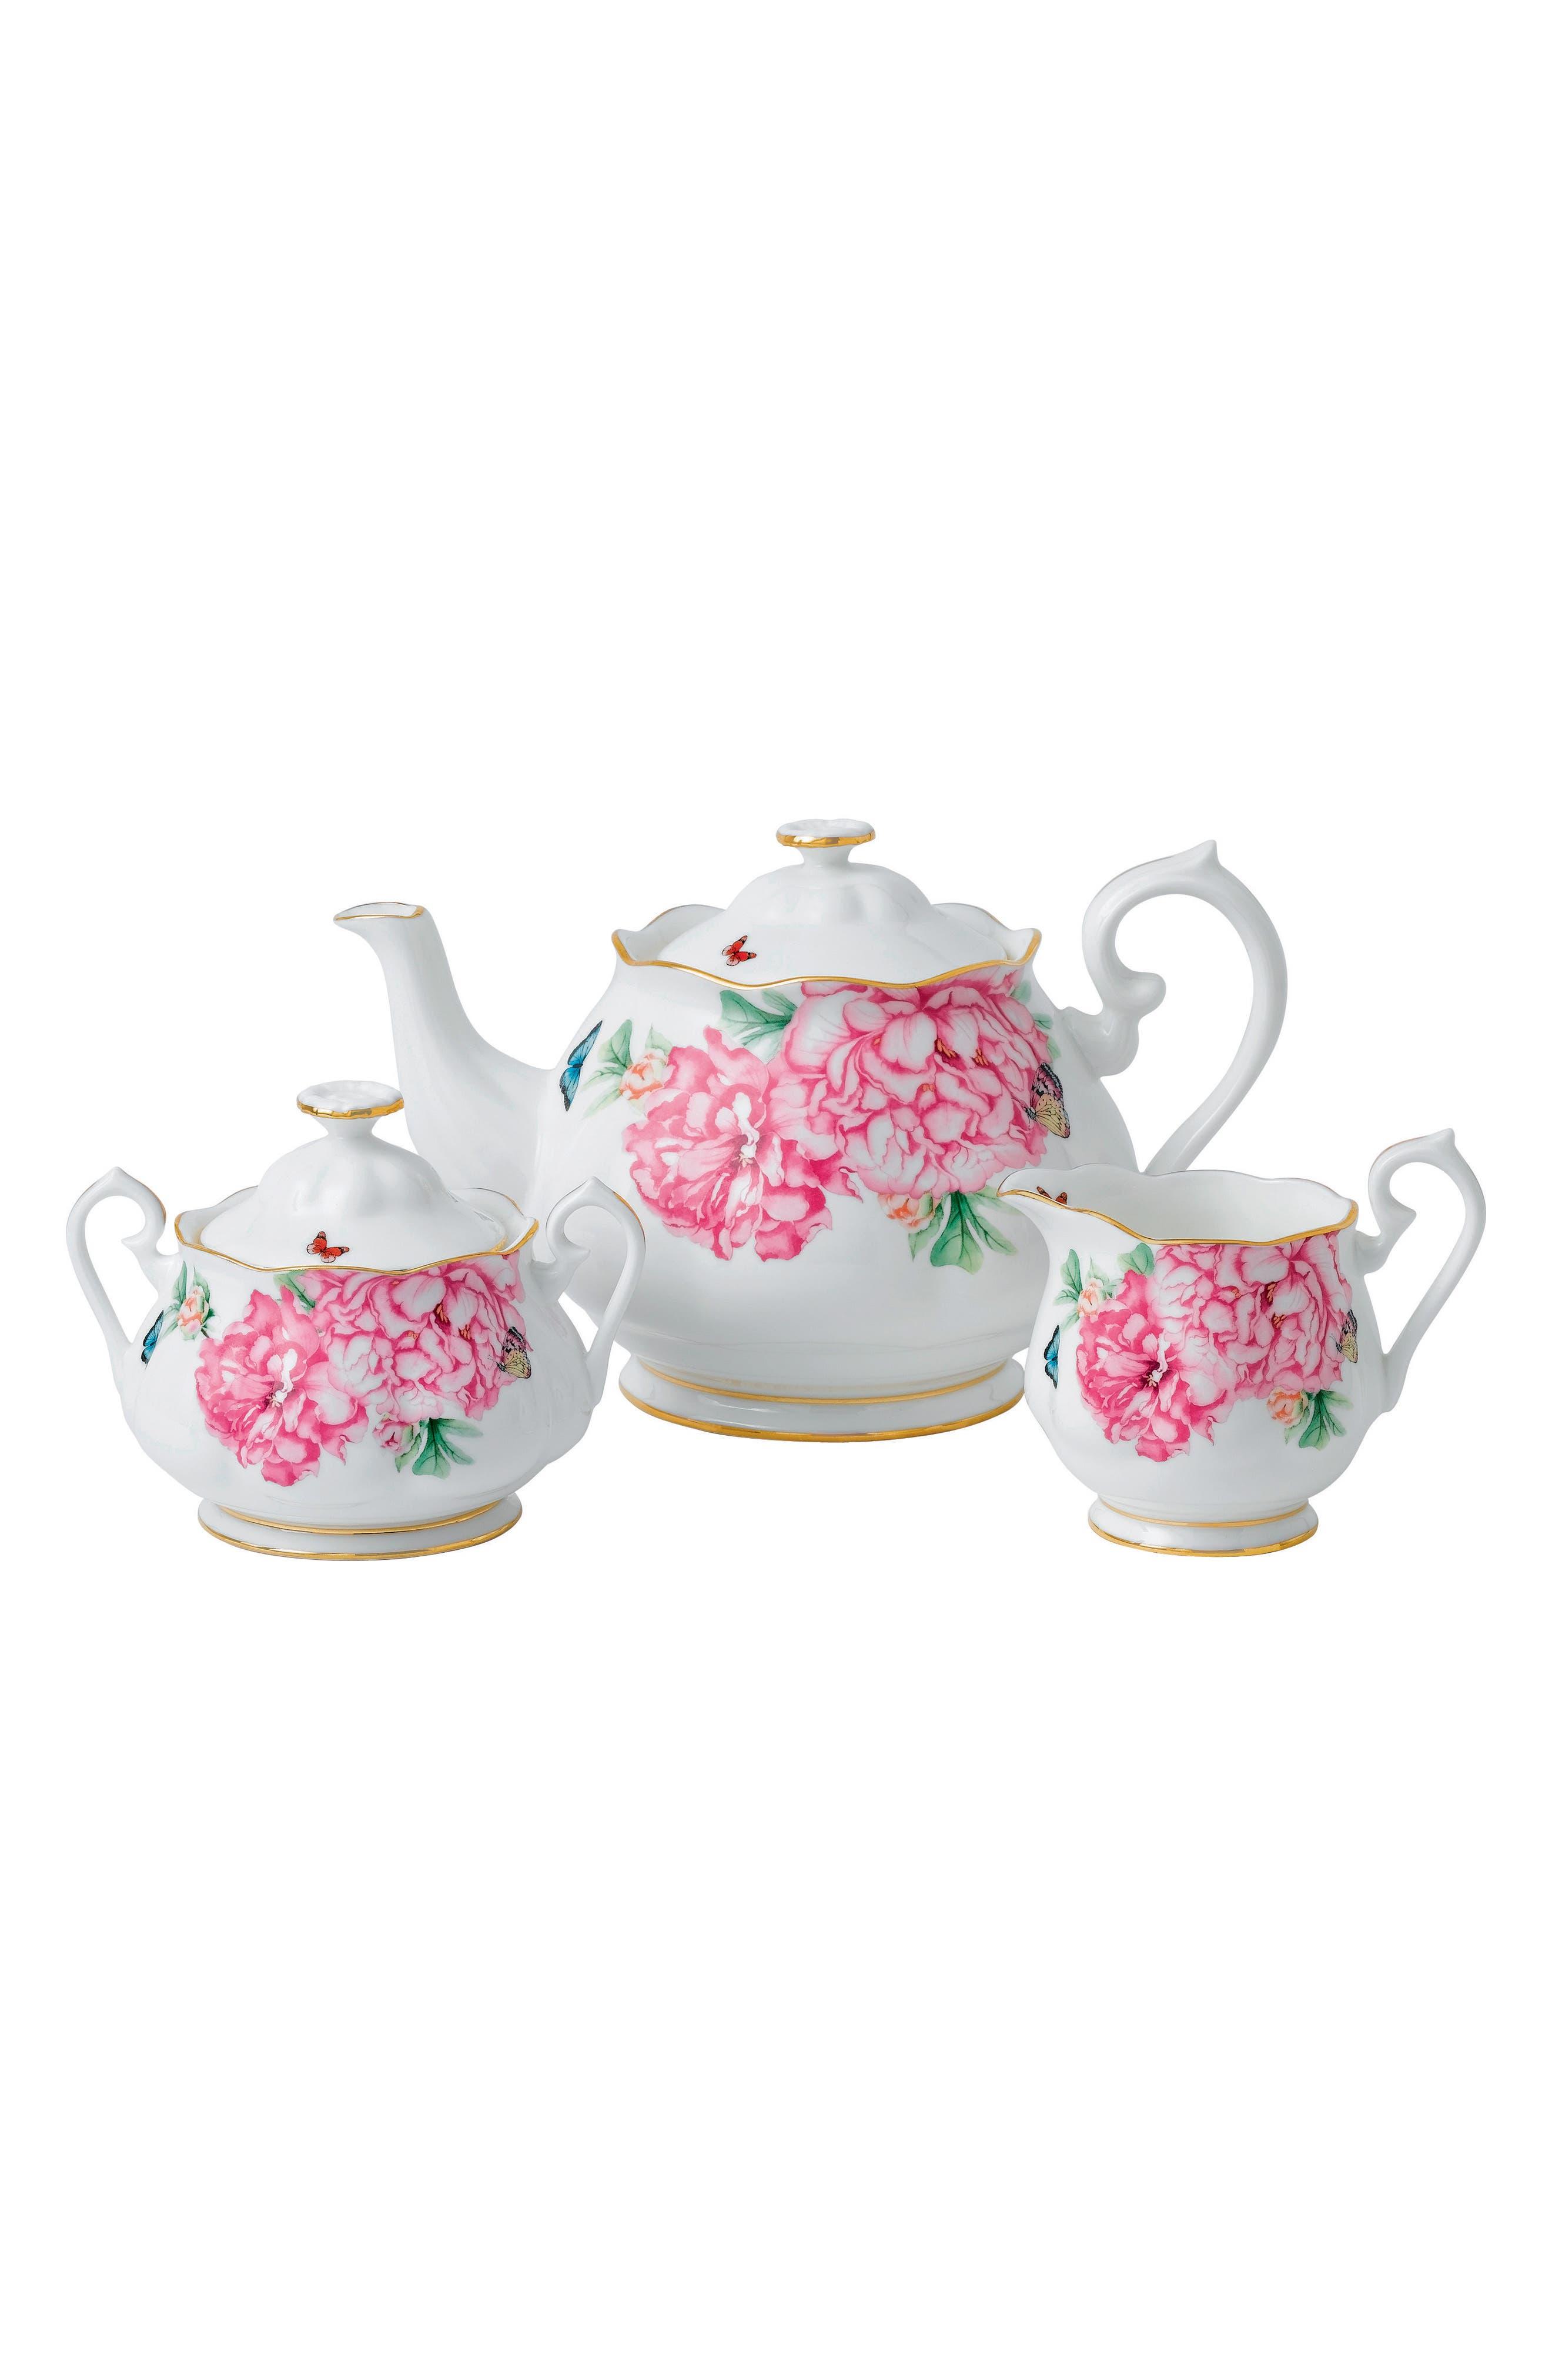 Main Image - Miranda Kerr for Royal Albert Friendship 3-Piece Tea Set